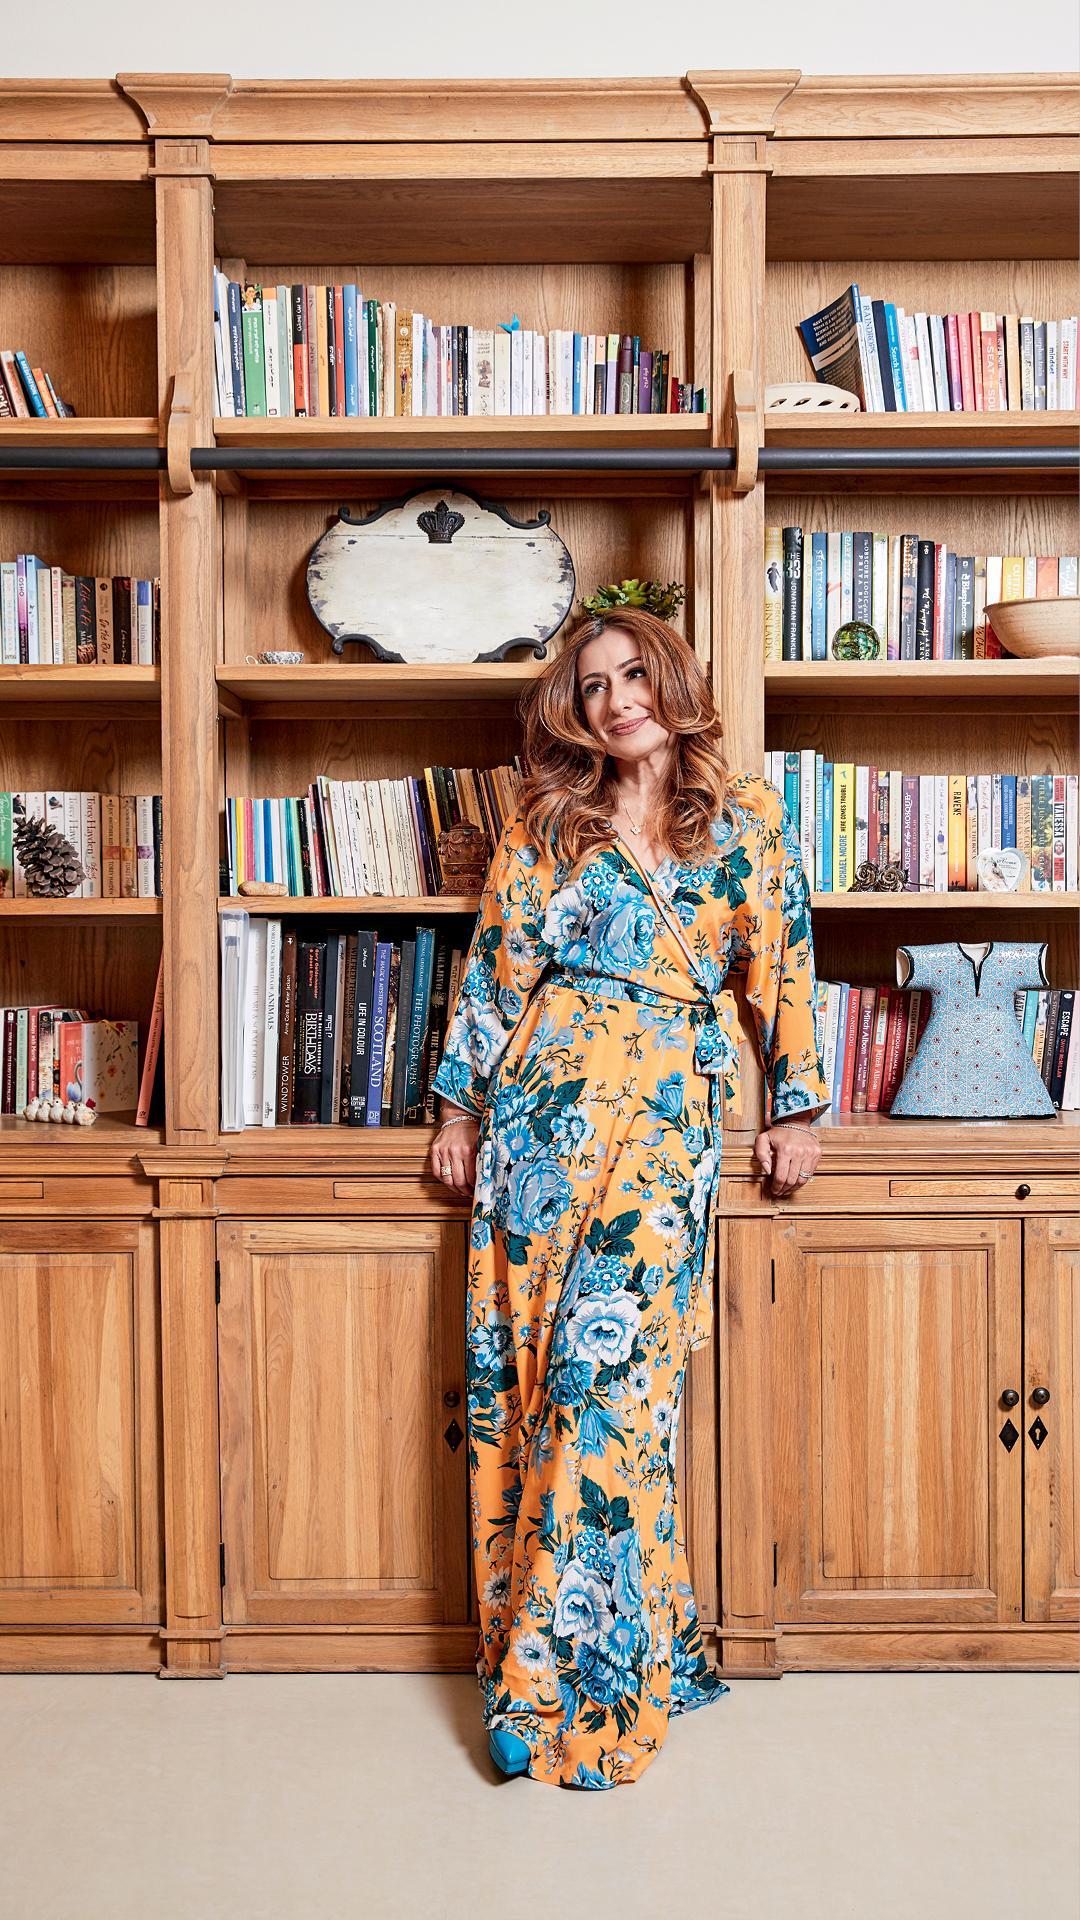 Hala Kazim; Journey To Change